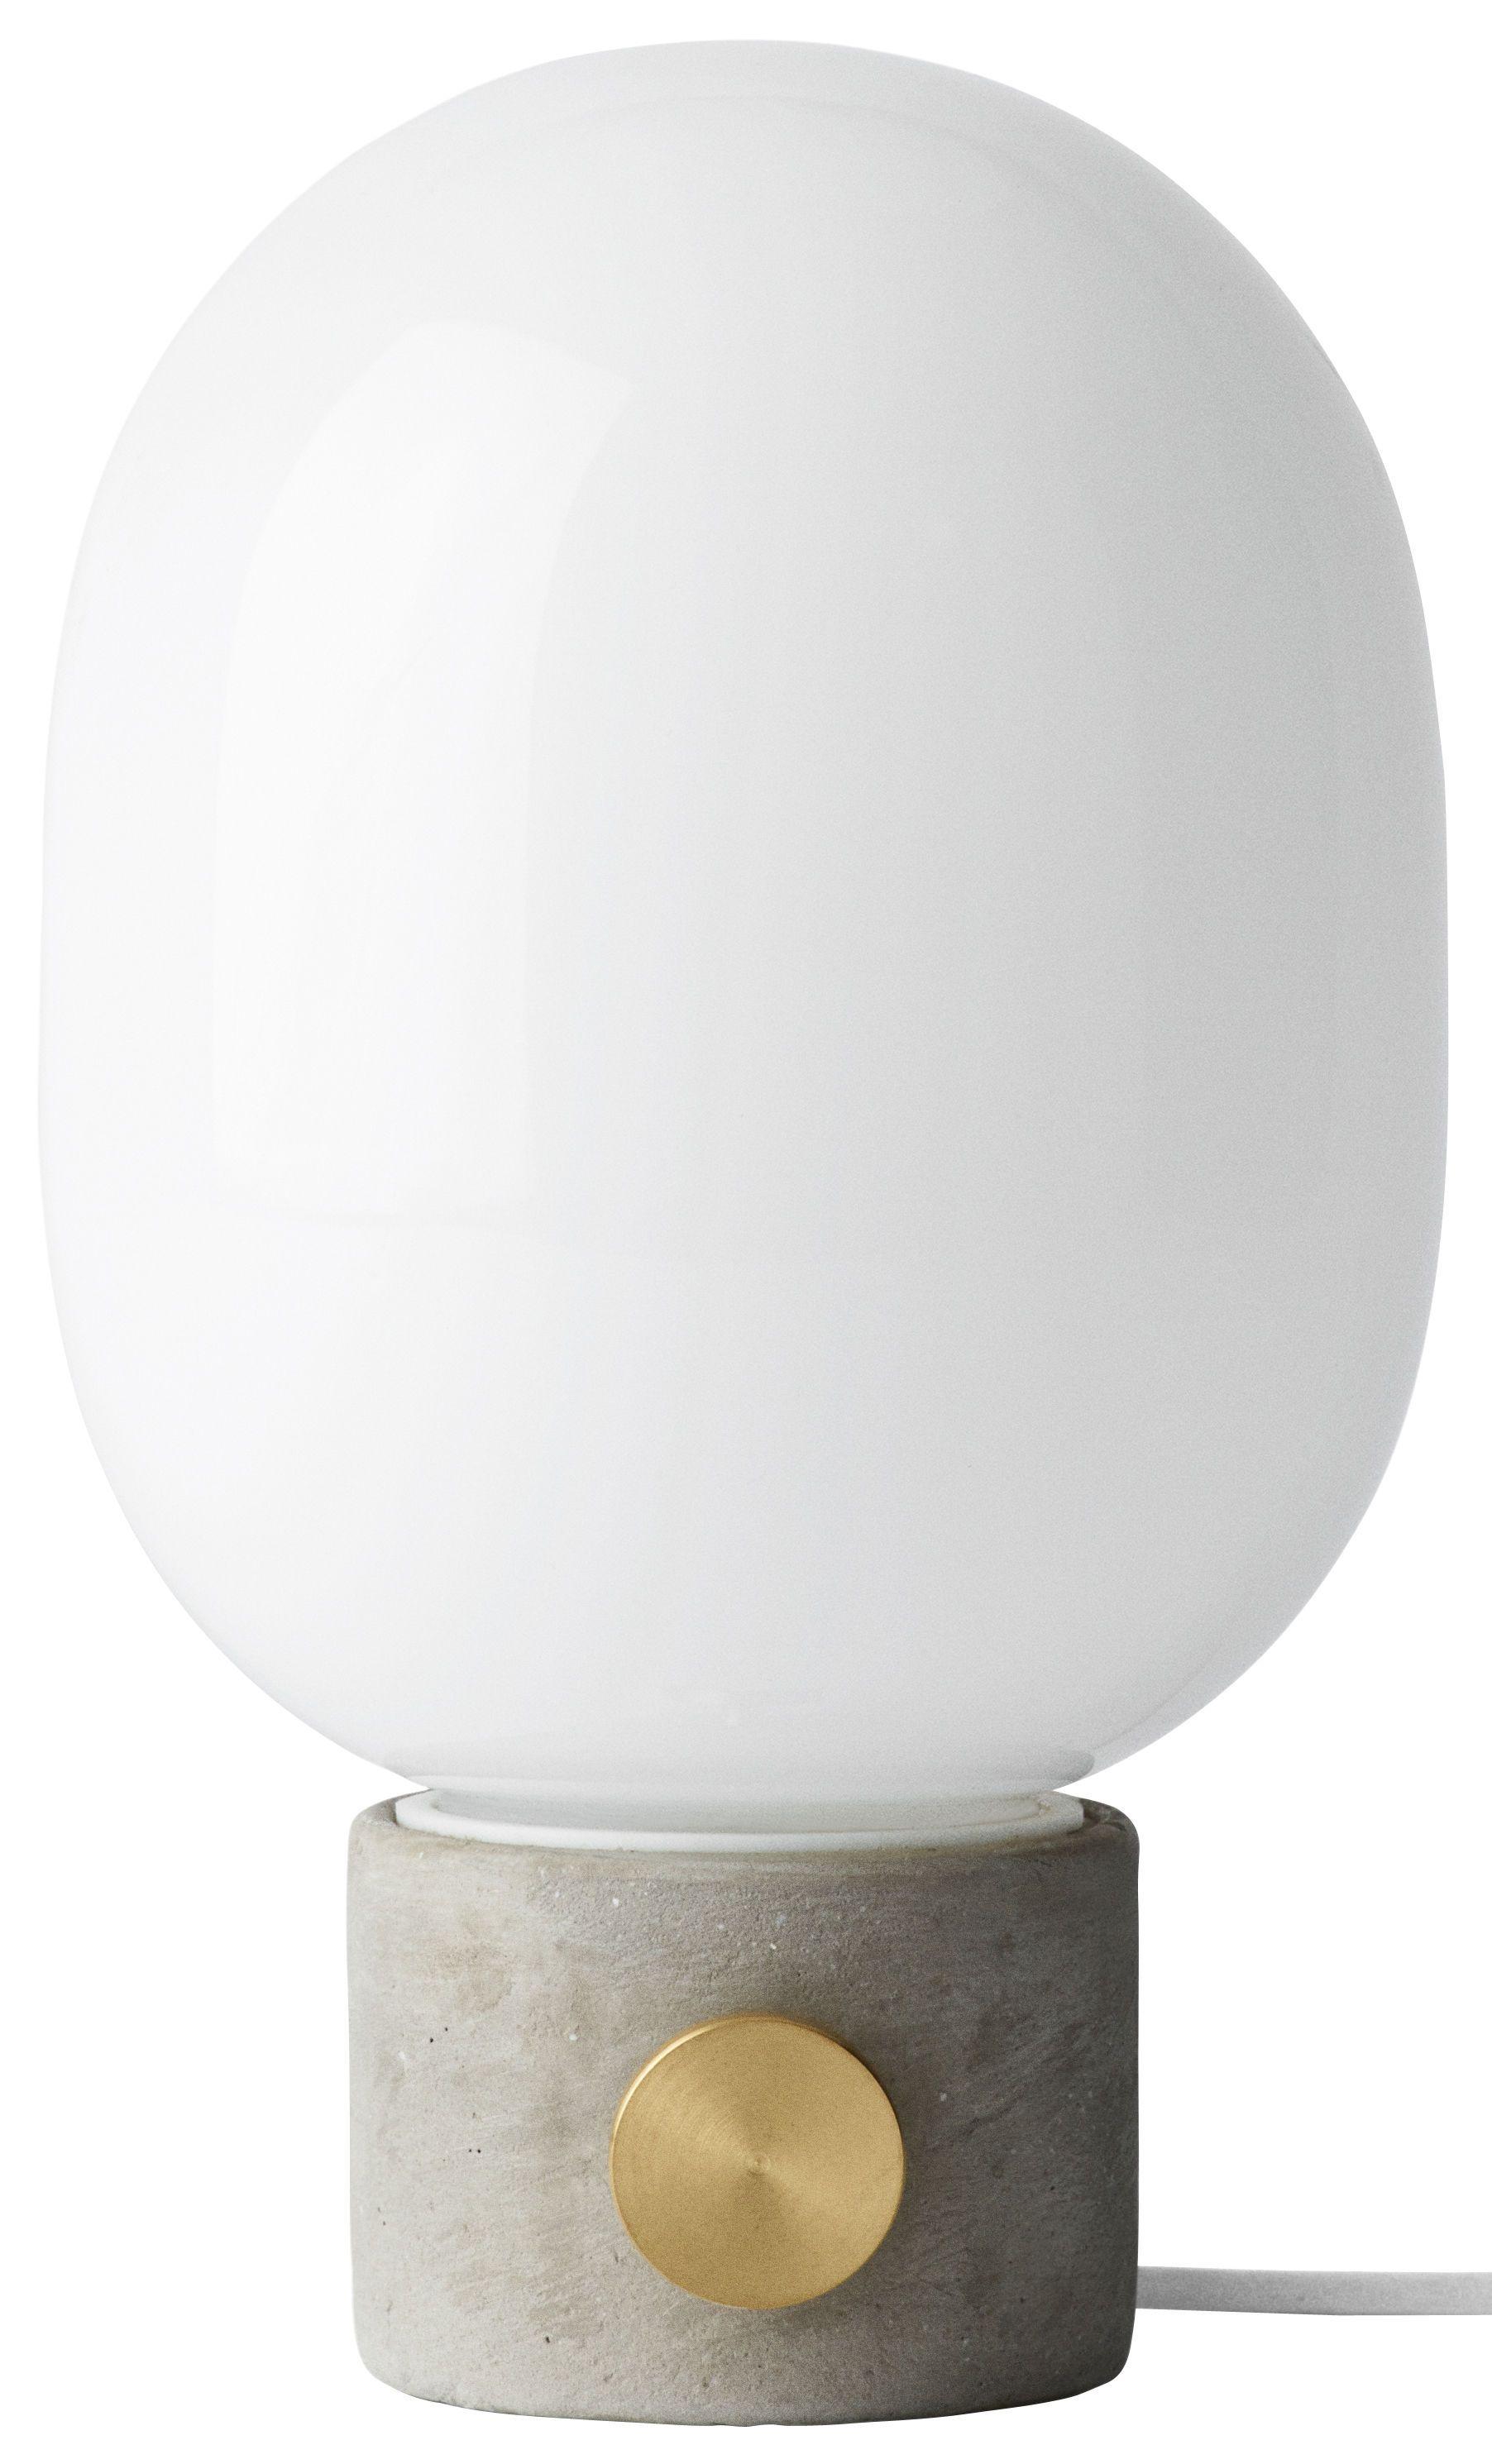 Lampe De Table Jwda Menu Blanc Gris Made In Design Lampes De Table Lampe De Table Blanche Lampe